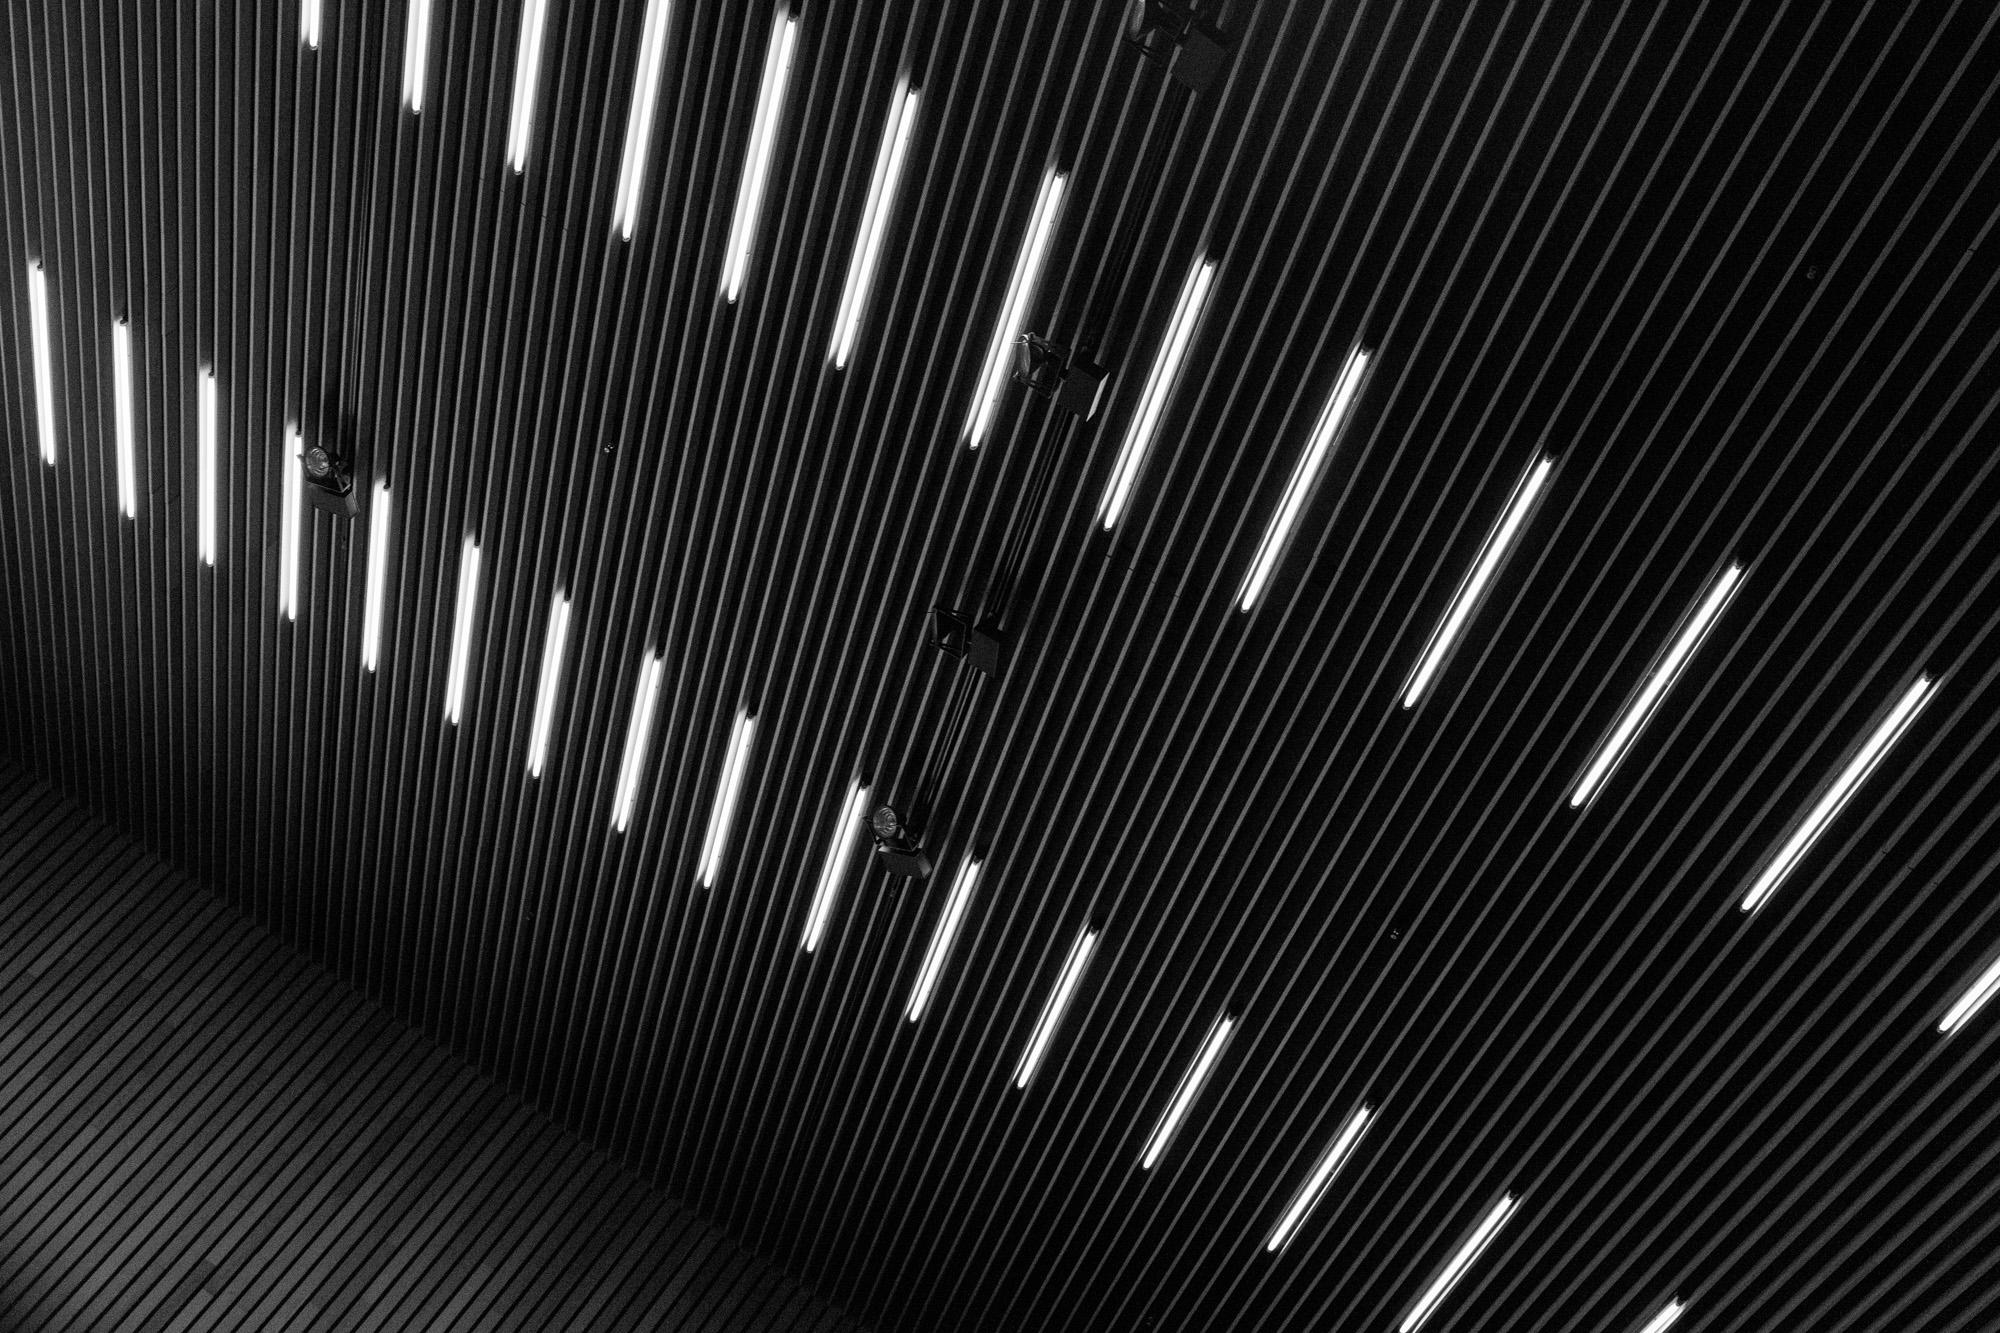 Fotografen: Samuel Solazzo, Jannis Uffrecht, Philipp Niemeyer